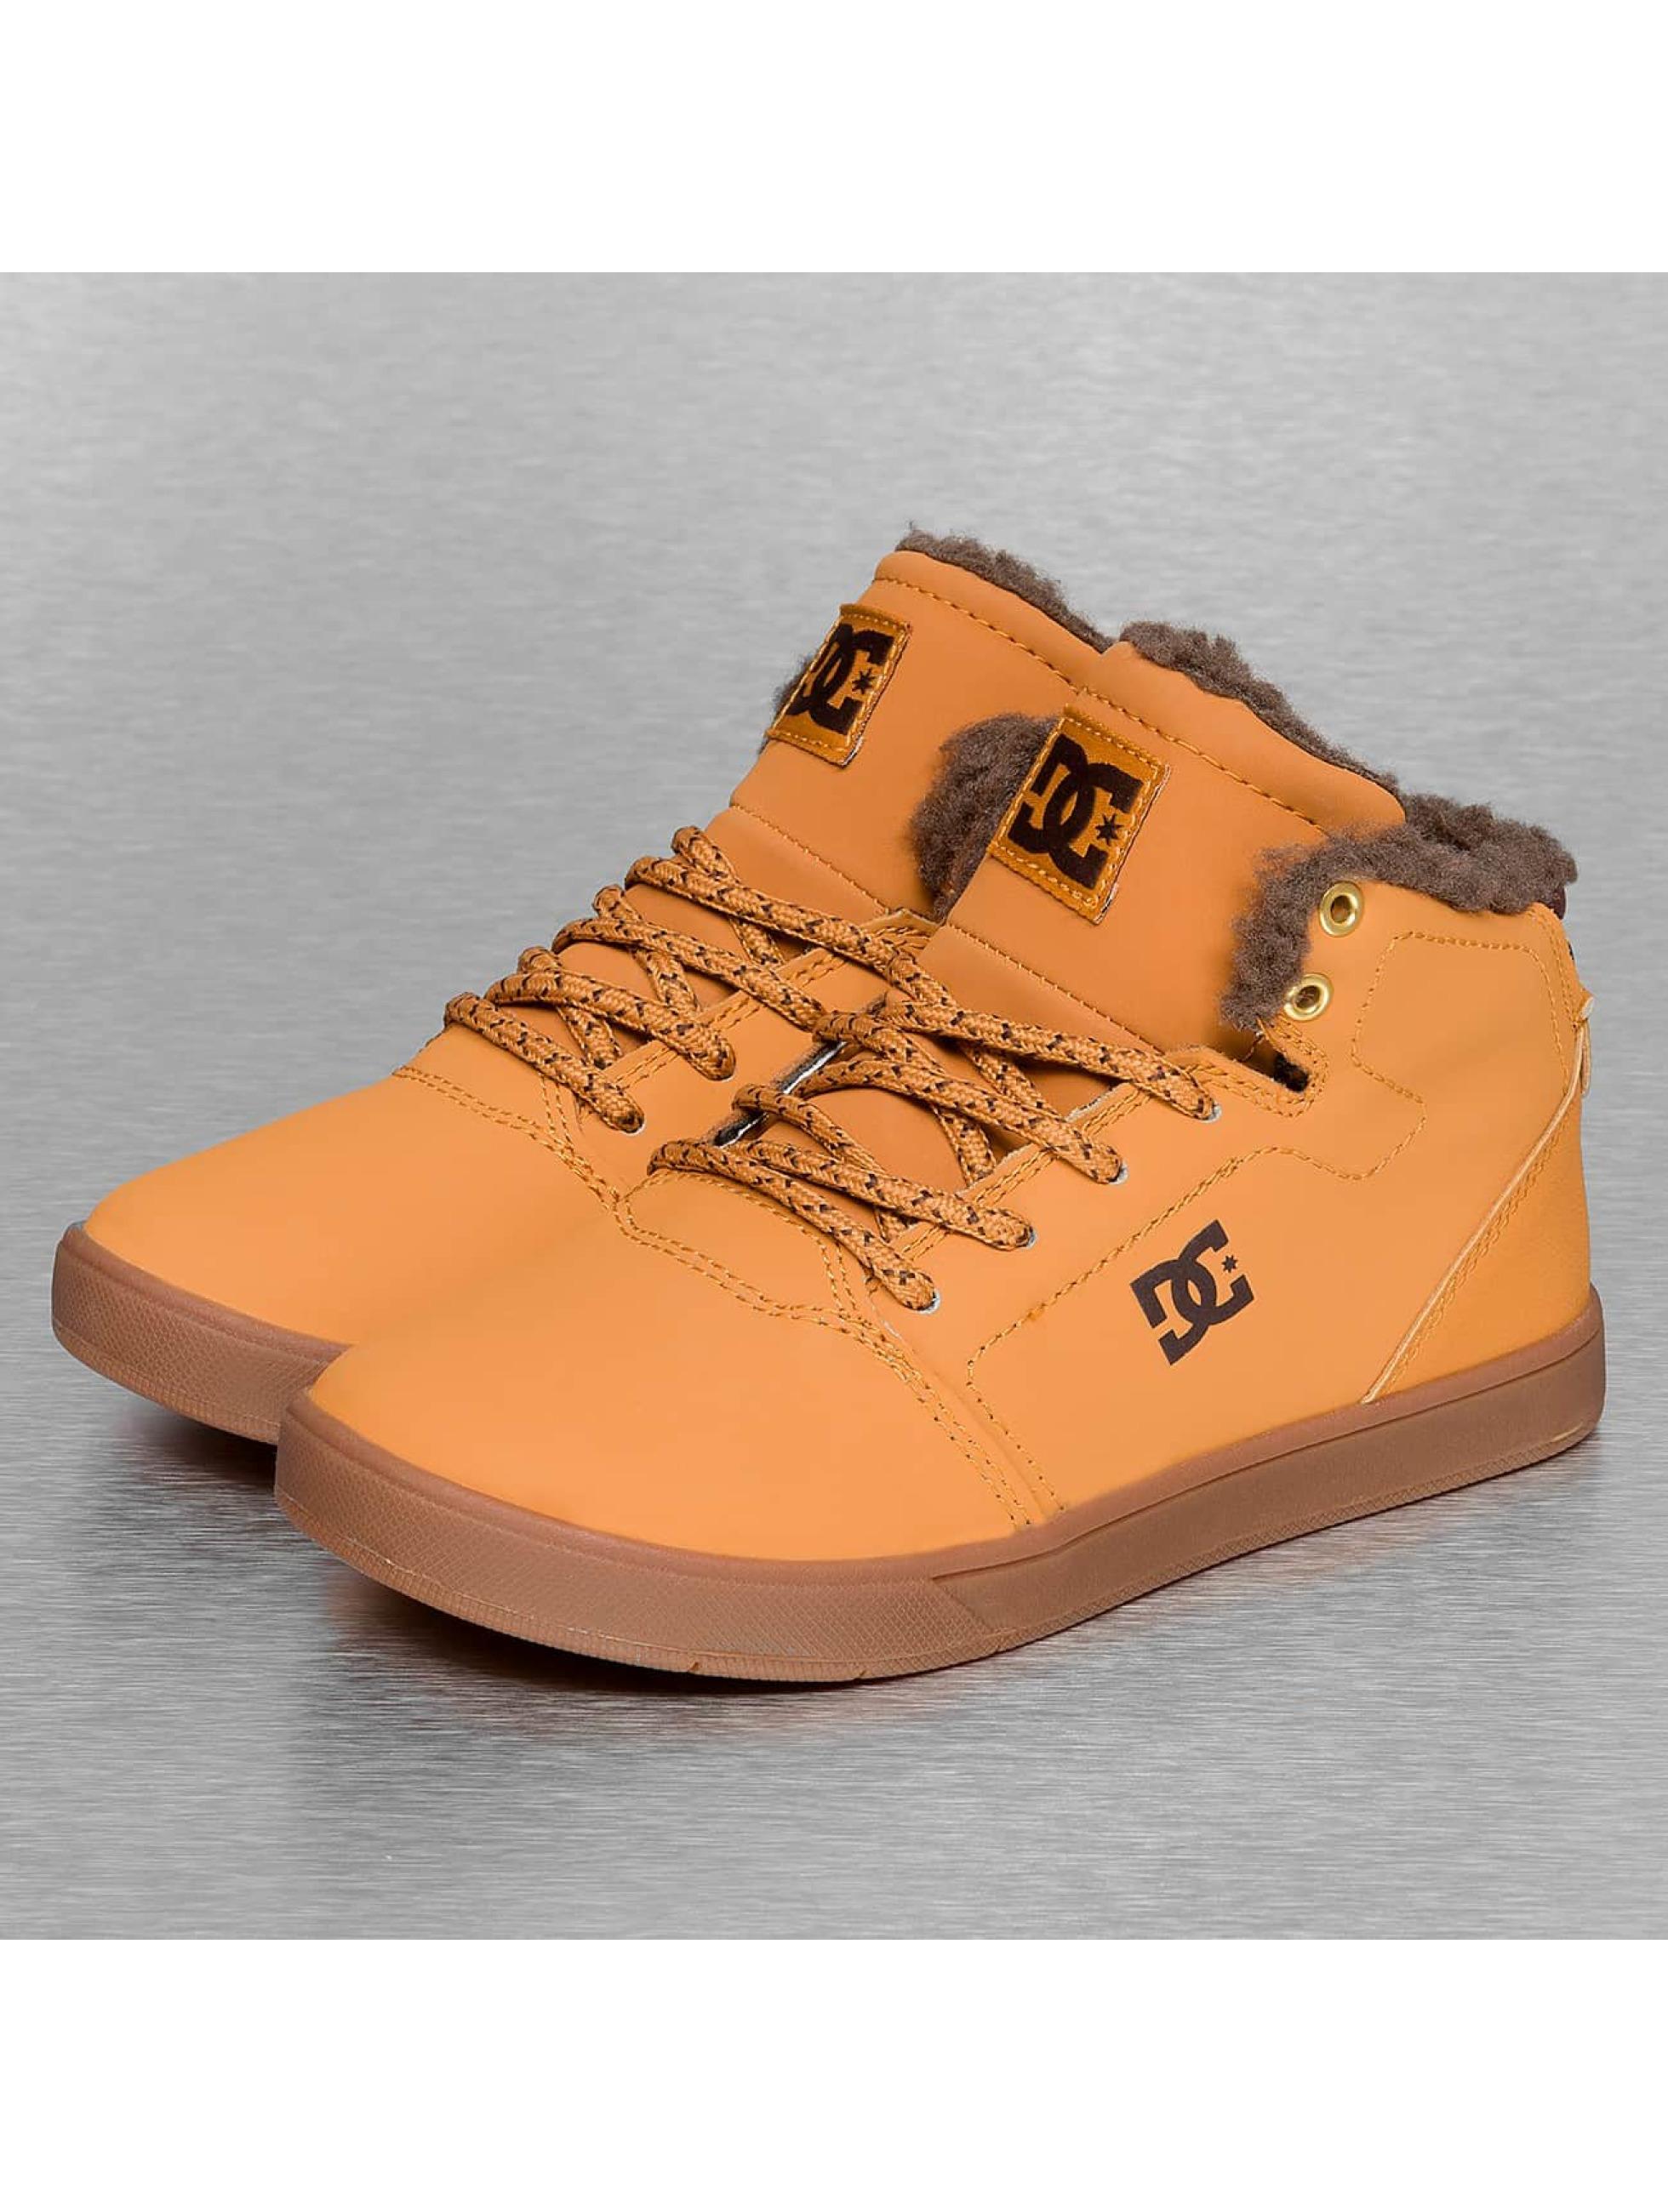 DC Crisis High WNT Sneakers Wheat/Dark Chocolate Sale Angebote